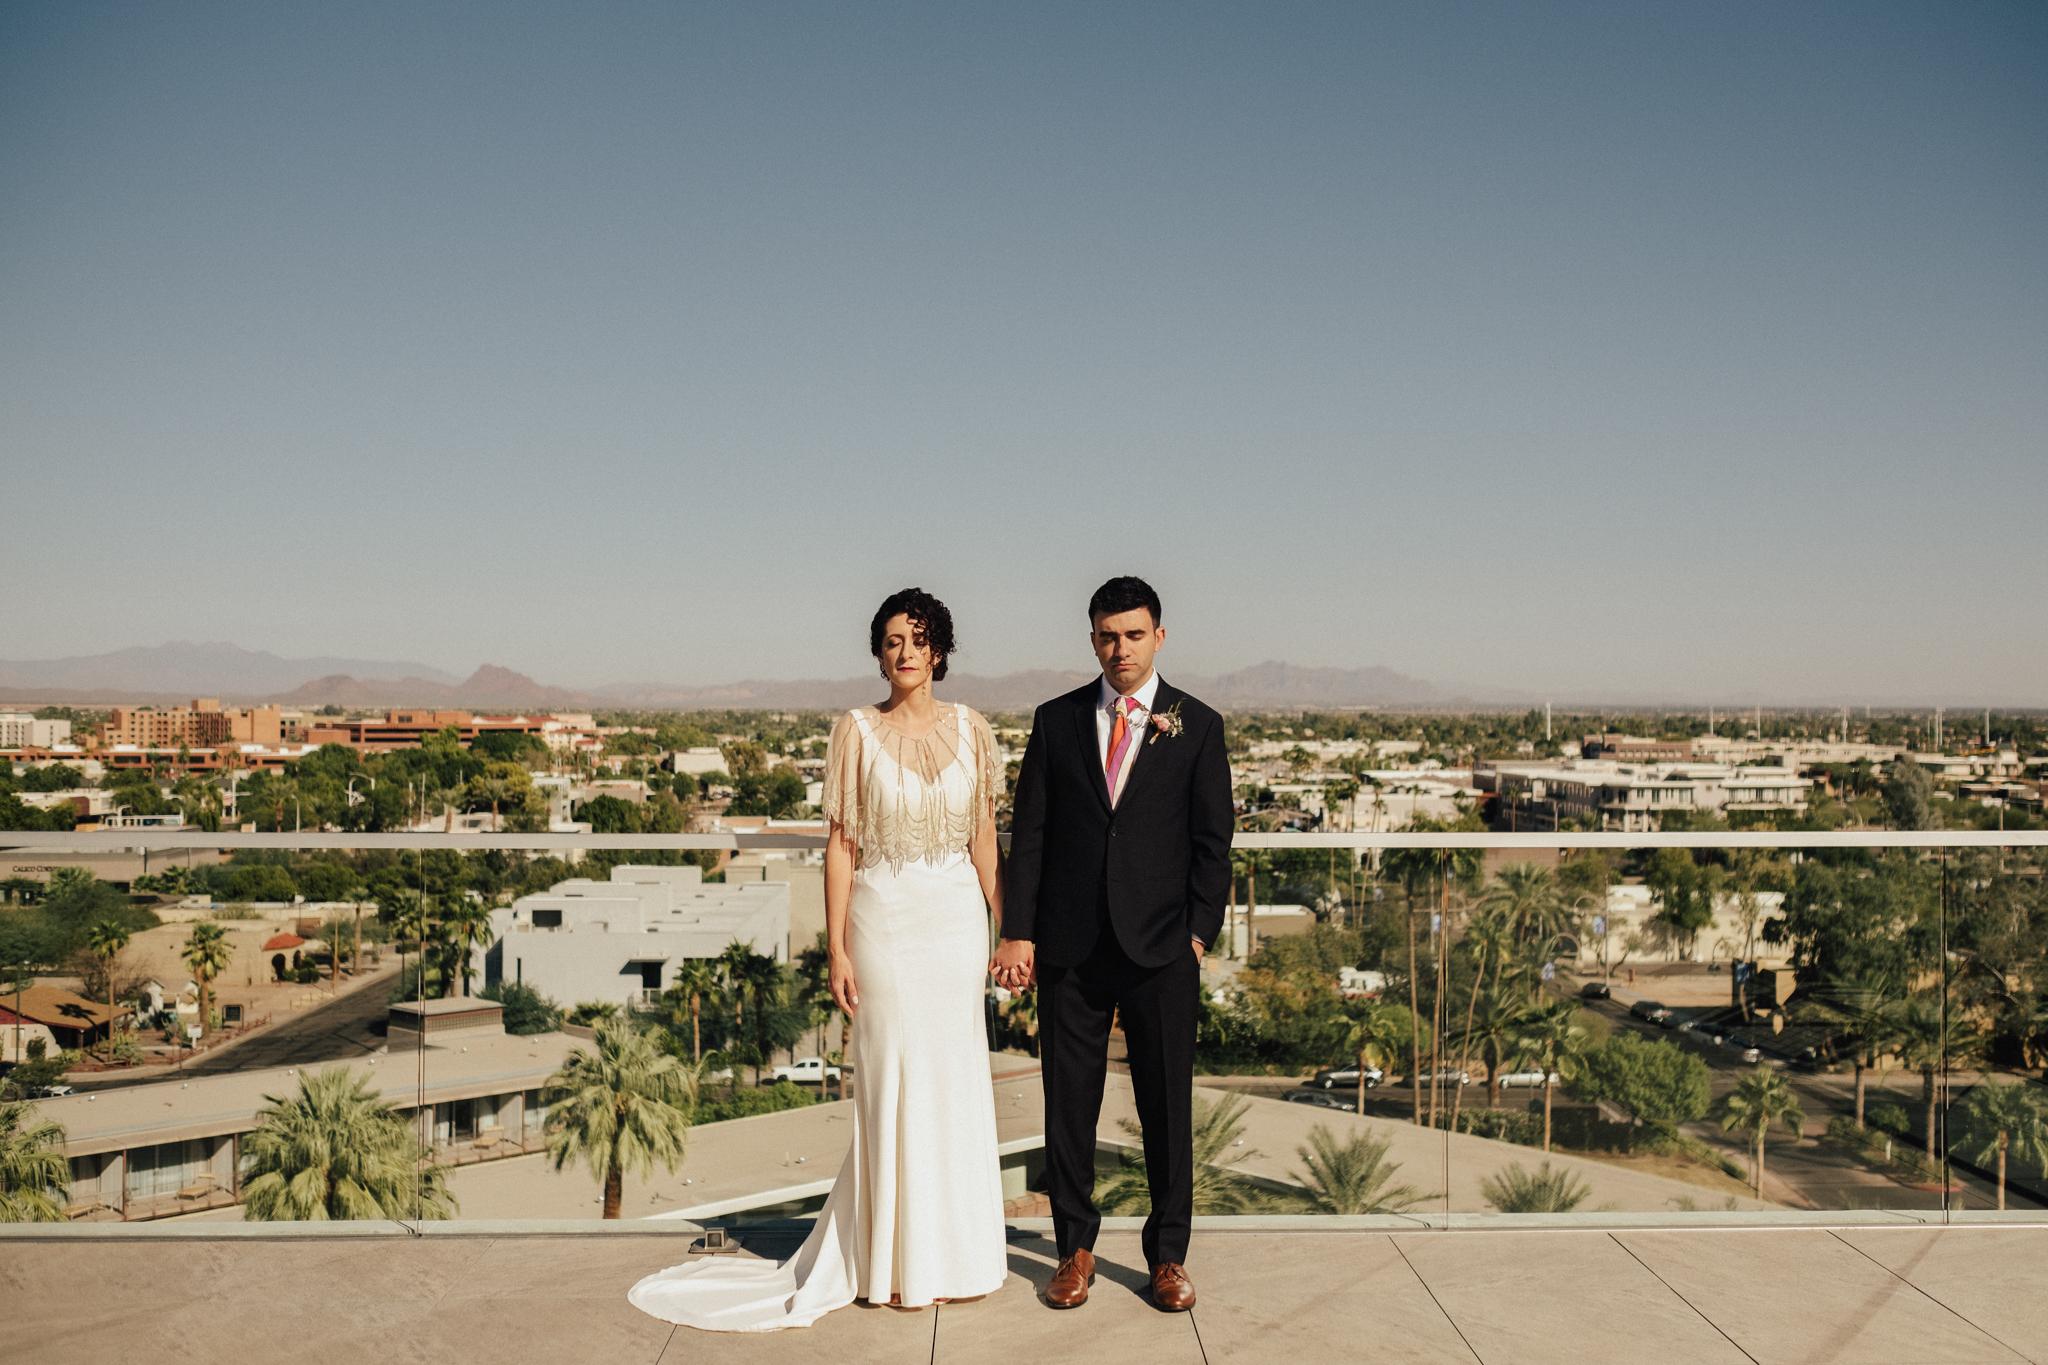 Arizona-Adventure-Elopement-Wedding-Photographer-170.jpg